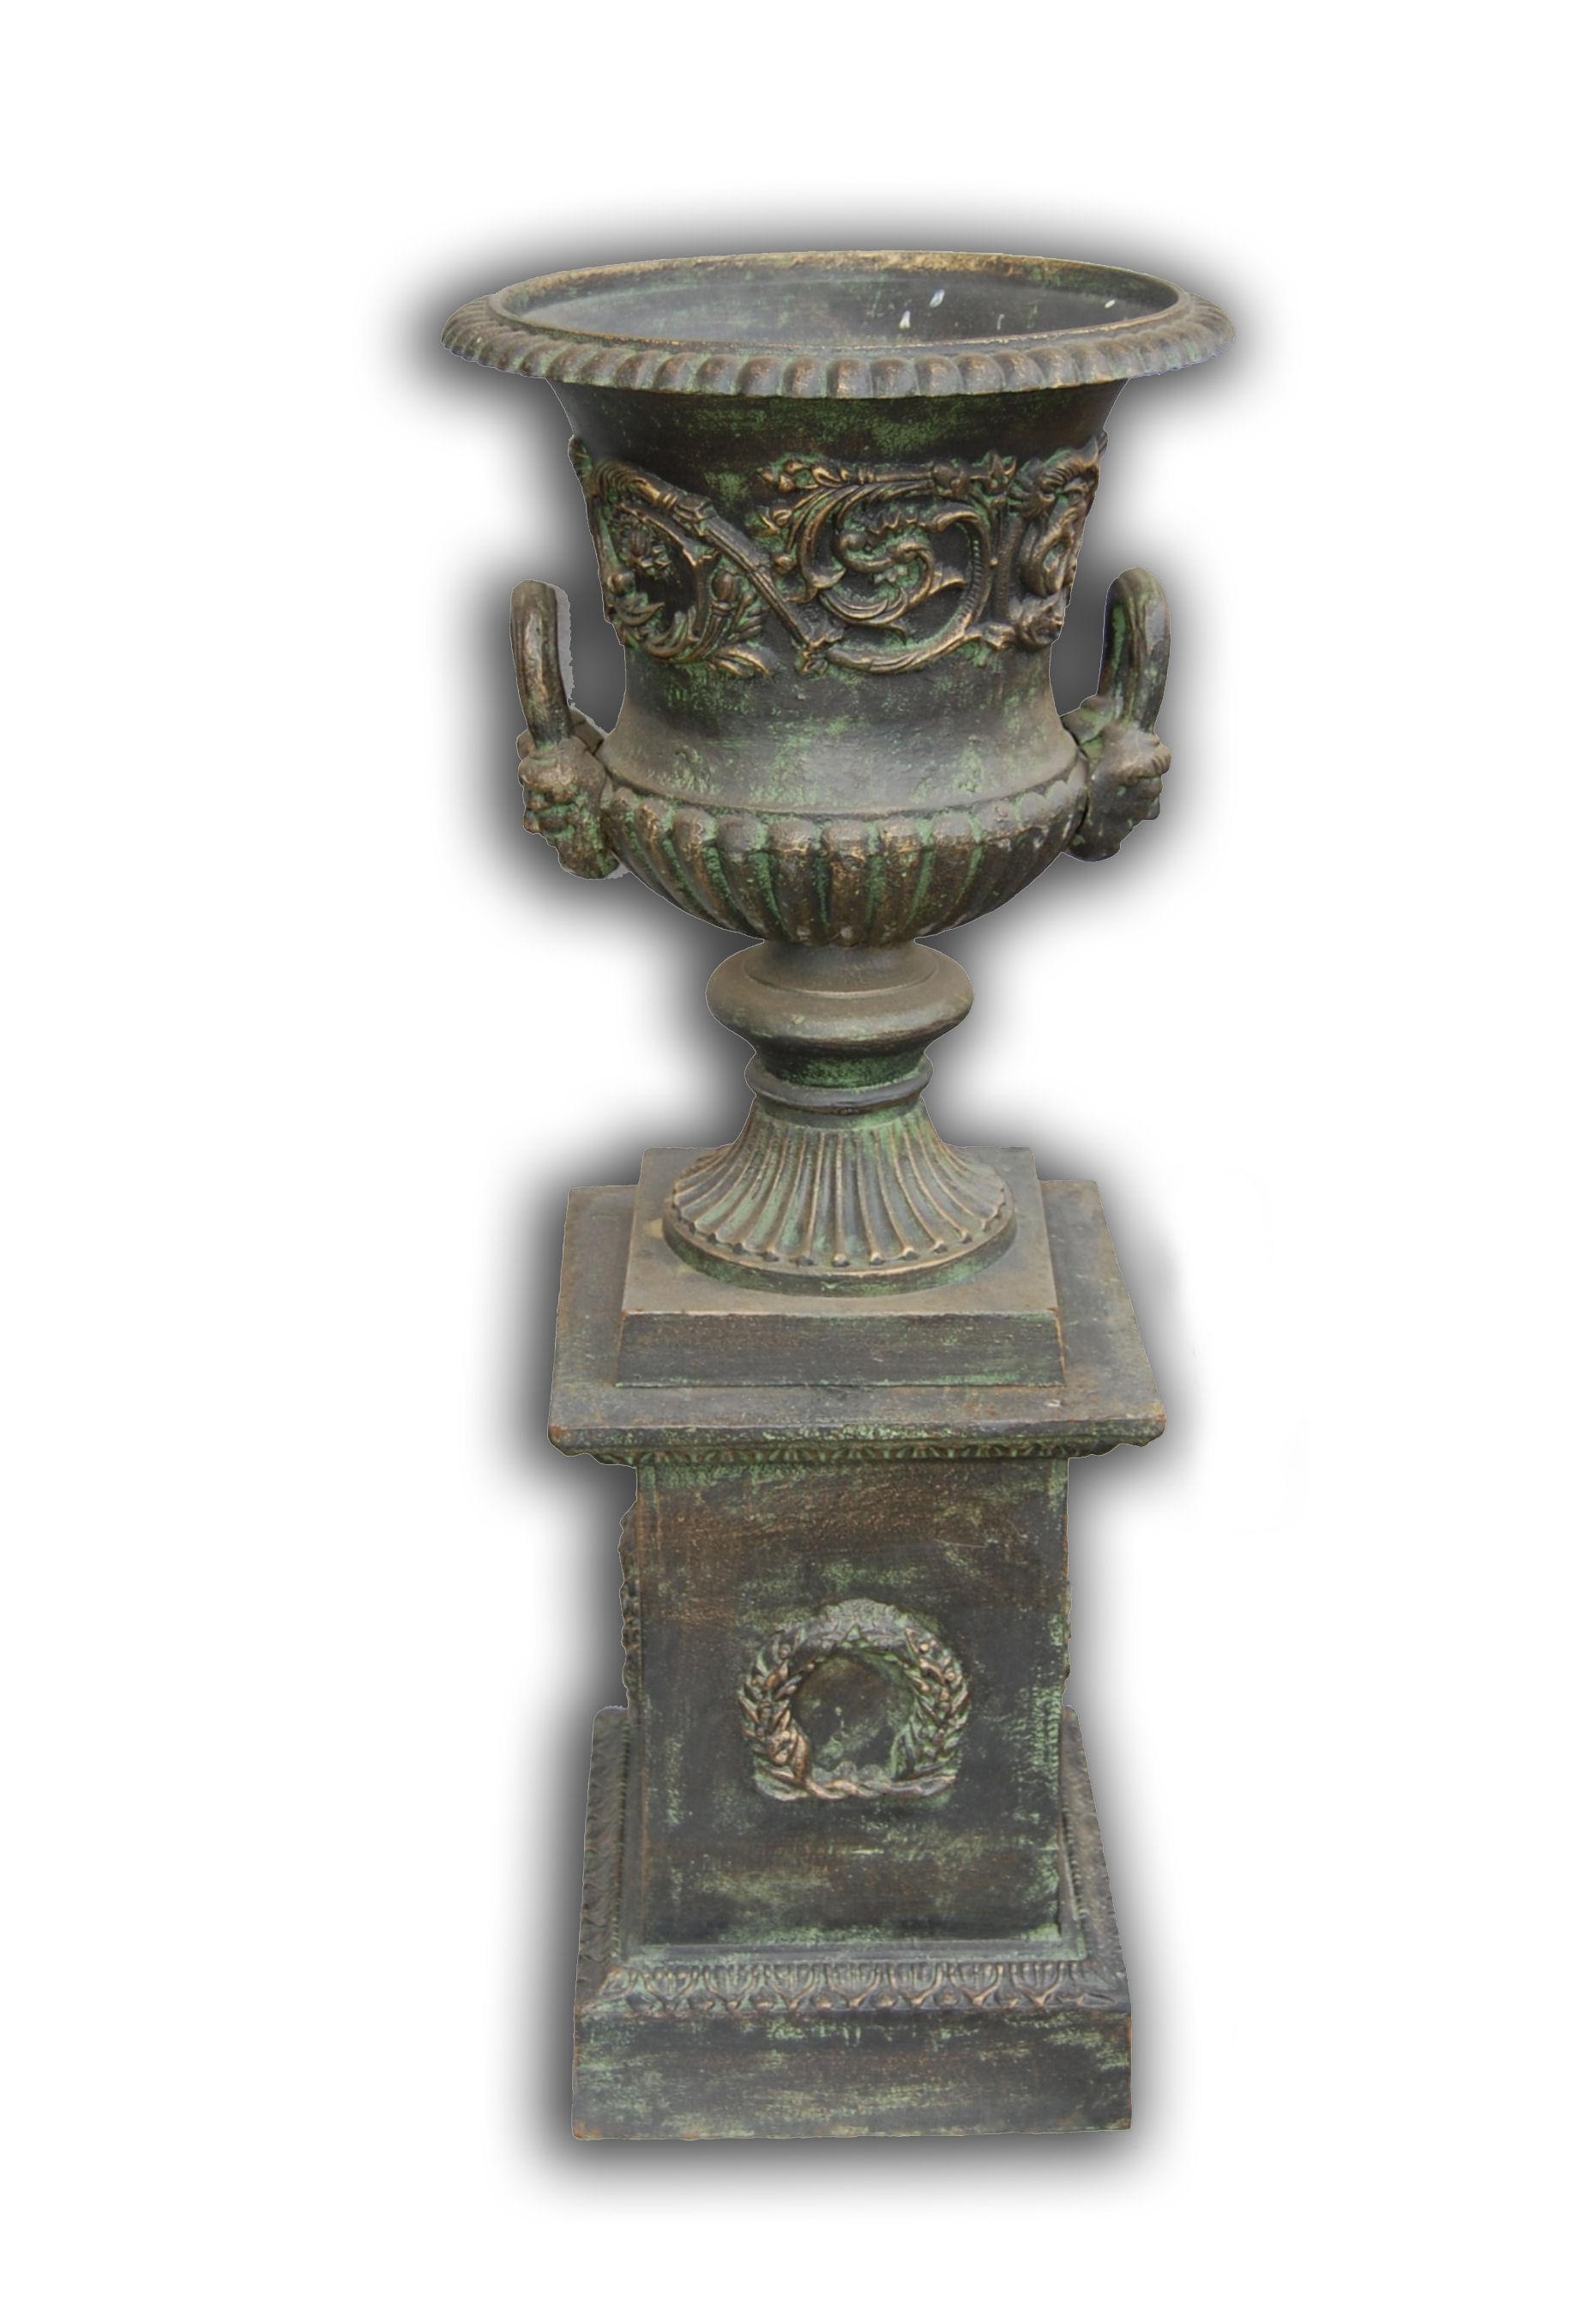 Vase mit Sockel - 2-76.JPG